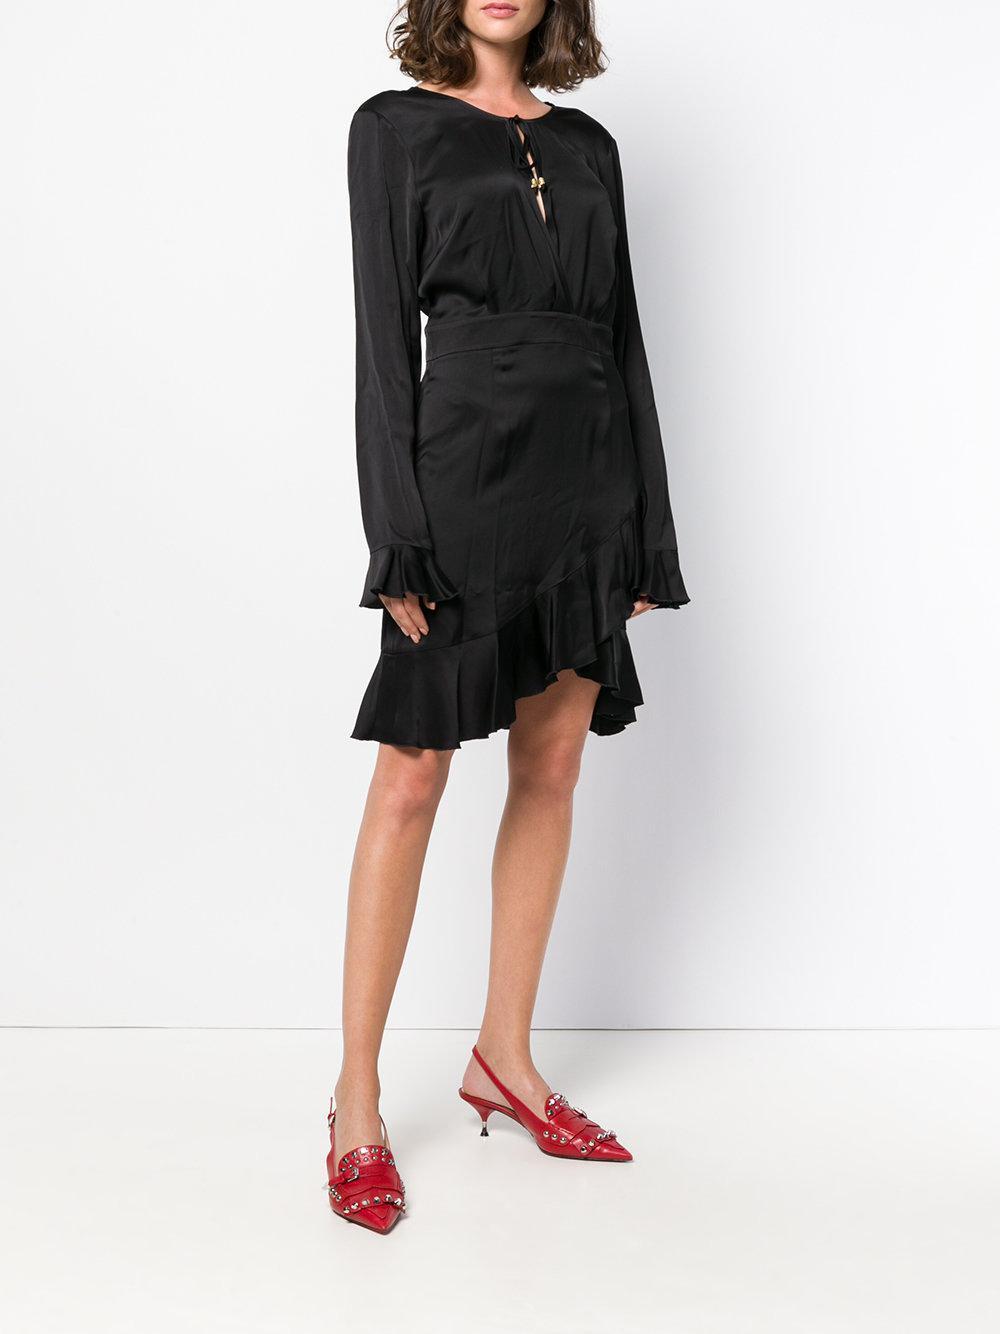 wrap around frill dress - Black Just Cavalli FwPjH3z